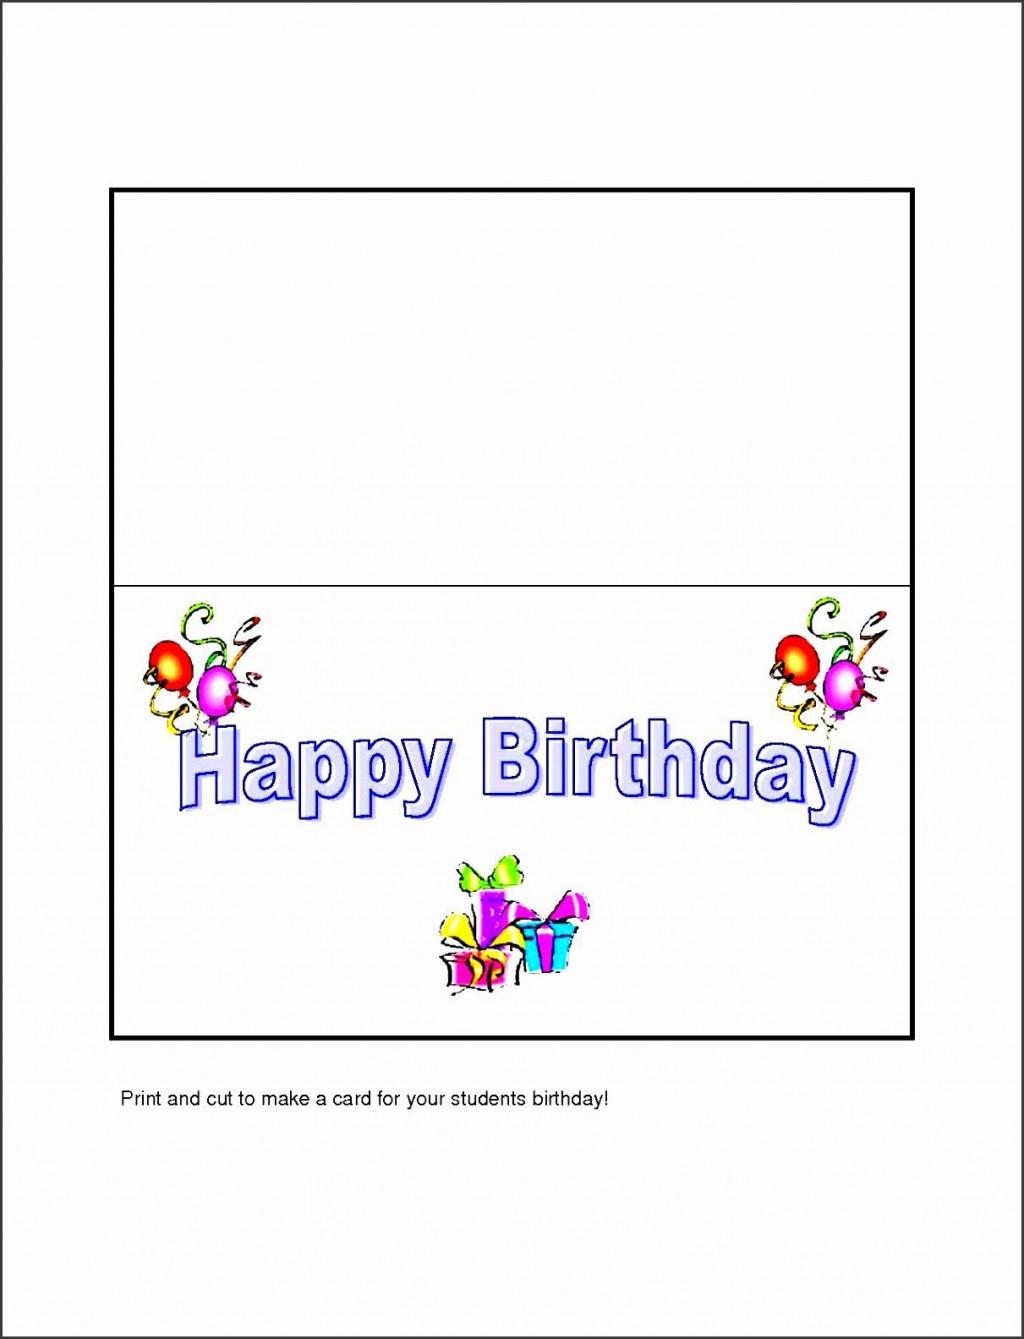 007 Amazing Microsoft Word Greeting Card Template Design  2003 Birthday DownloadLarge